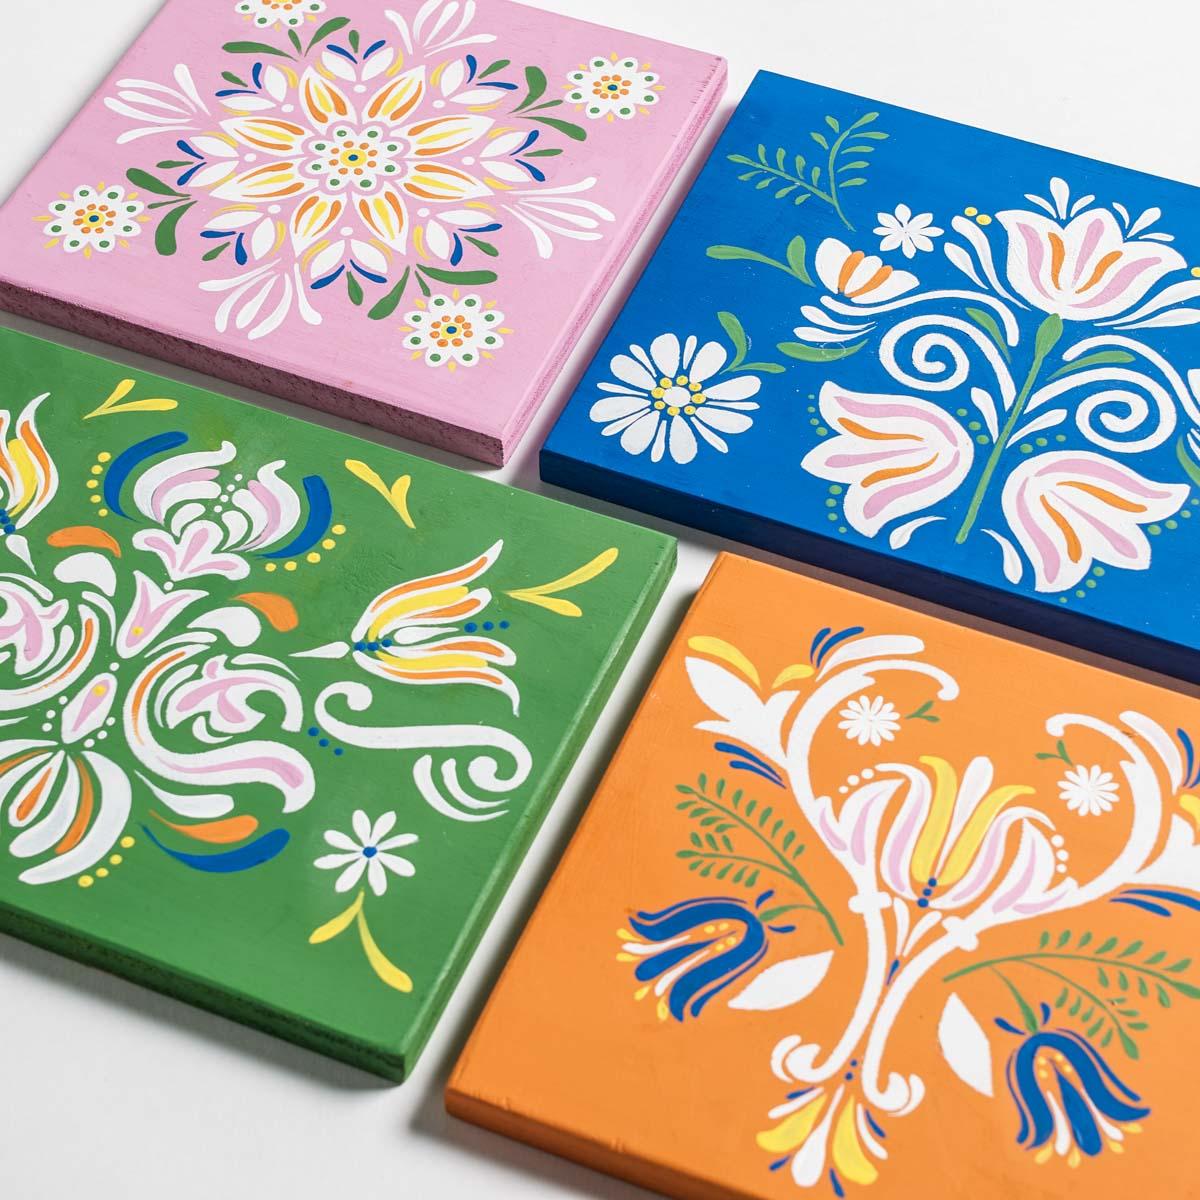 FolkArt ® Acrylic Colors Best Sellers 18 pc, Set 1 - PROMOFAI